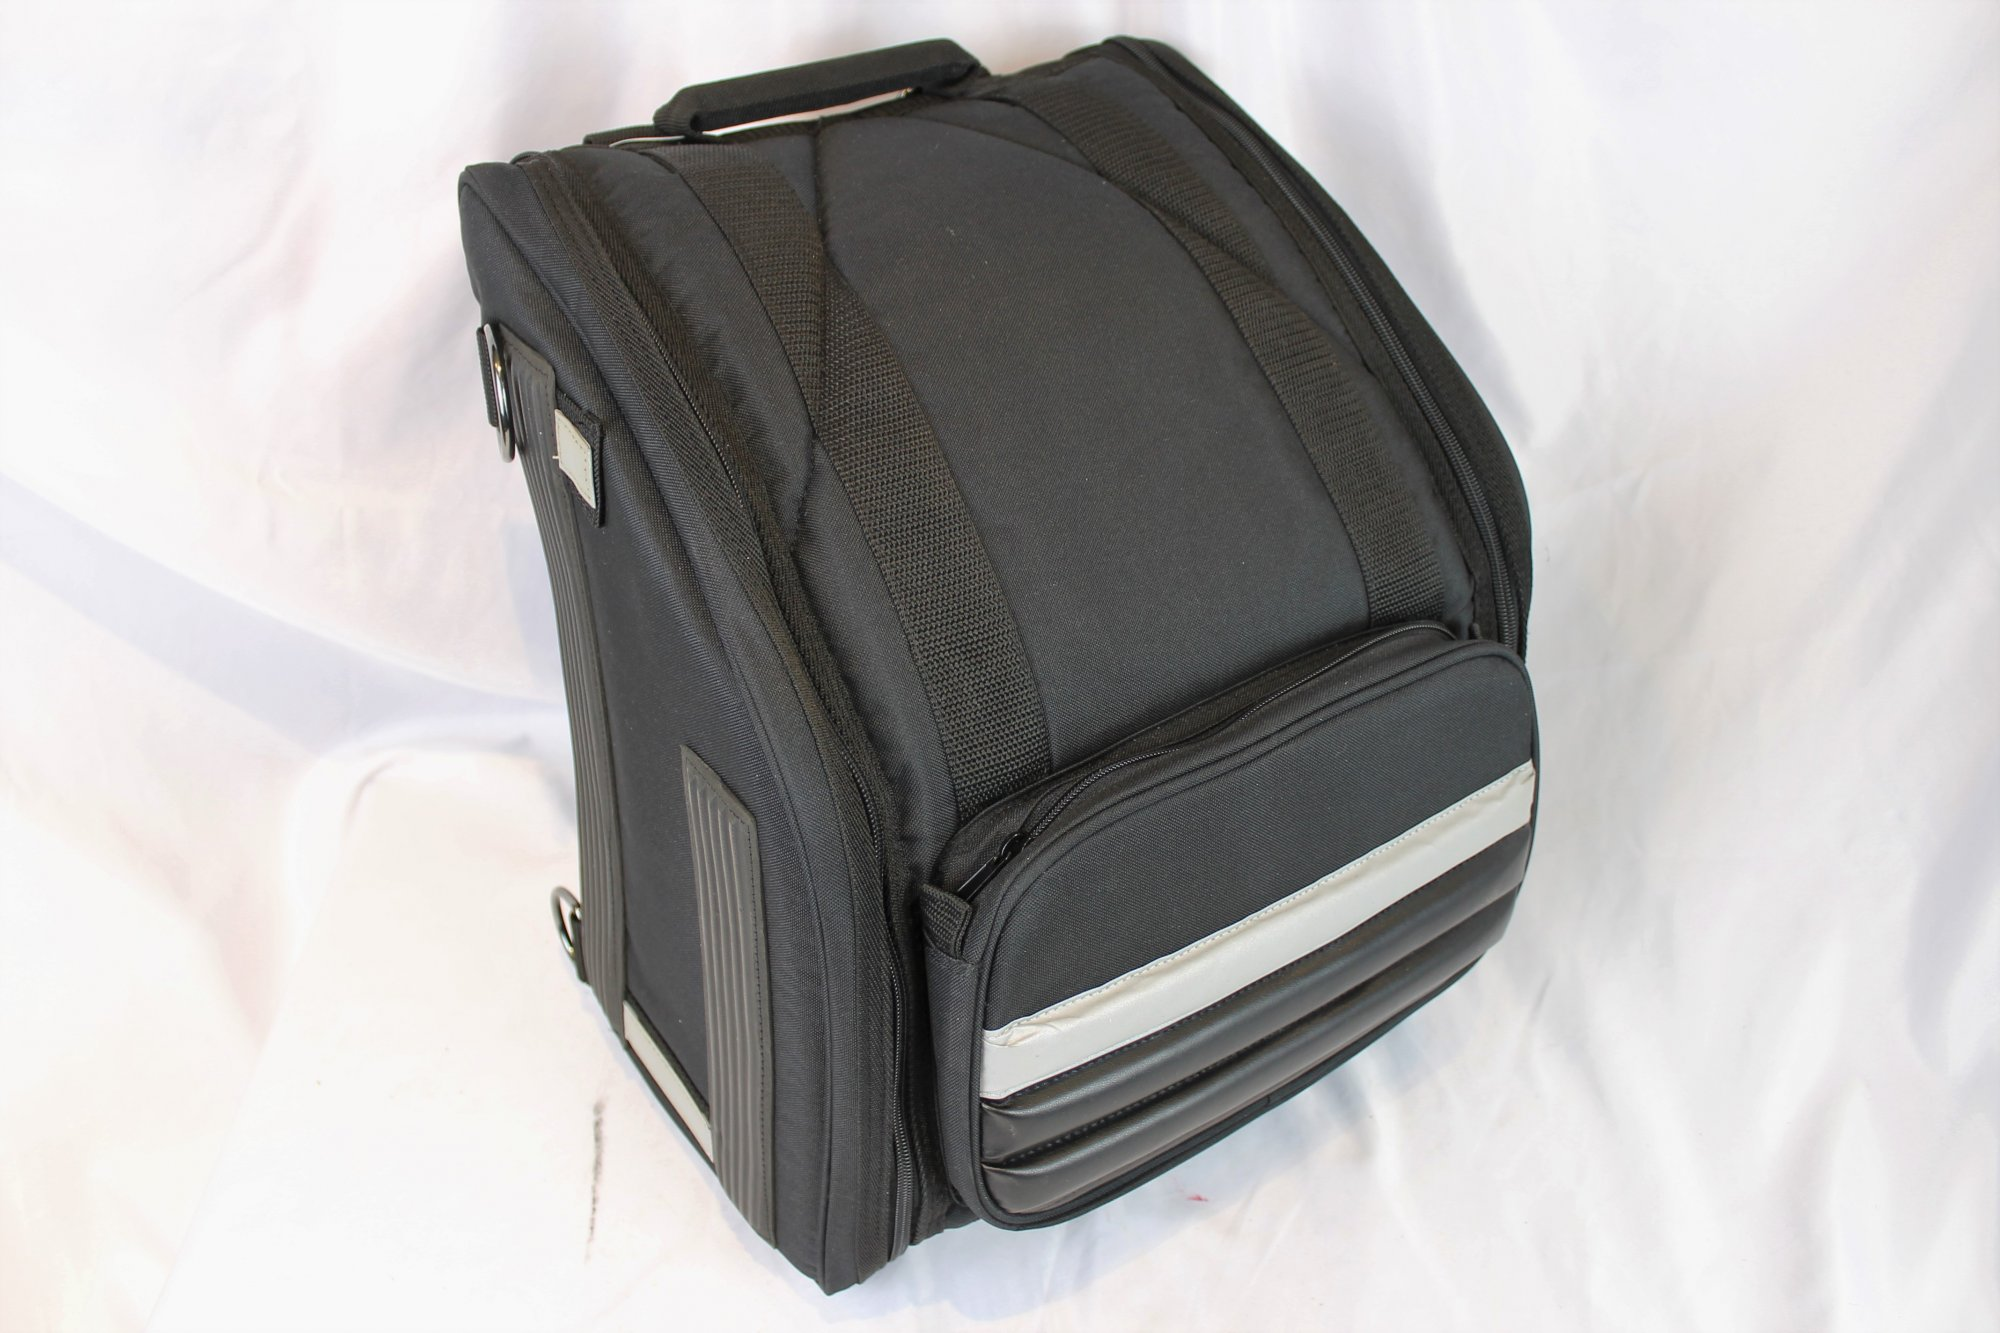 Black Gig Bag for Accordion 13 x 15 x 9